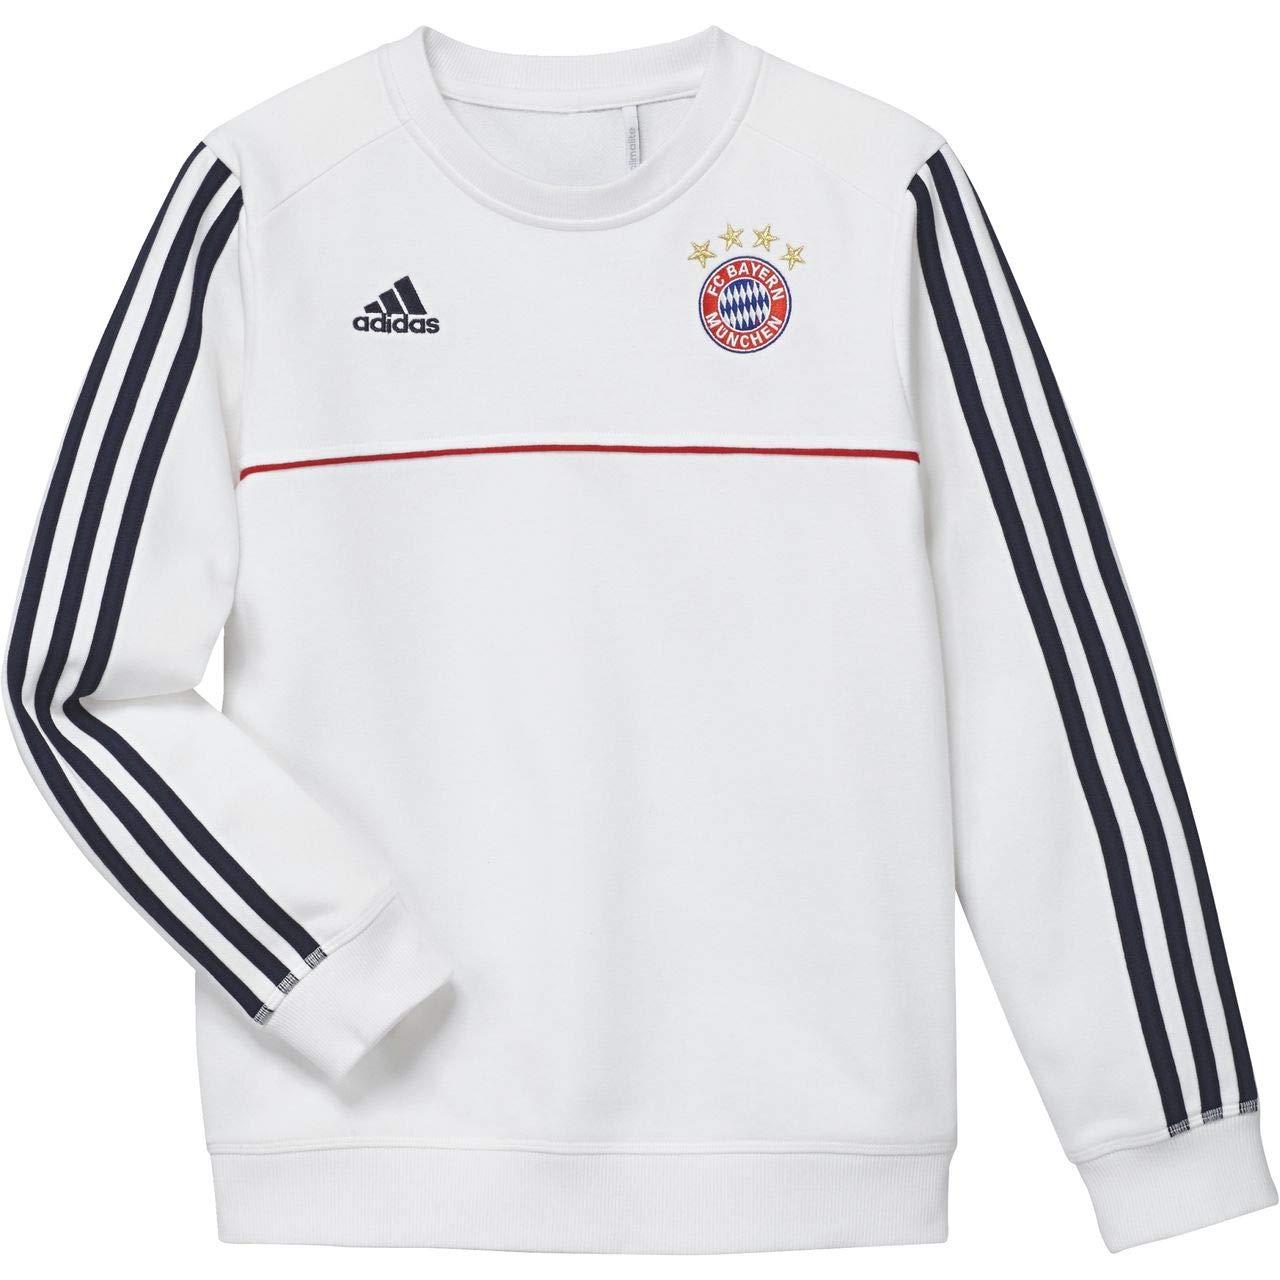 Adidas Kinder Fc Bayern München Sweatshirt